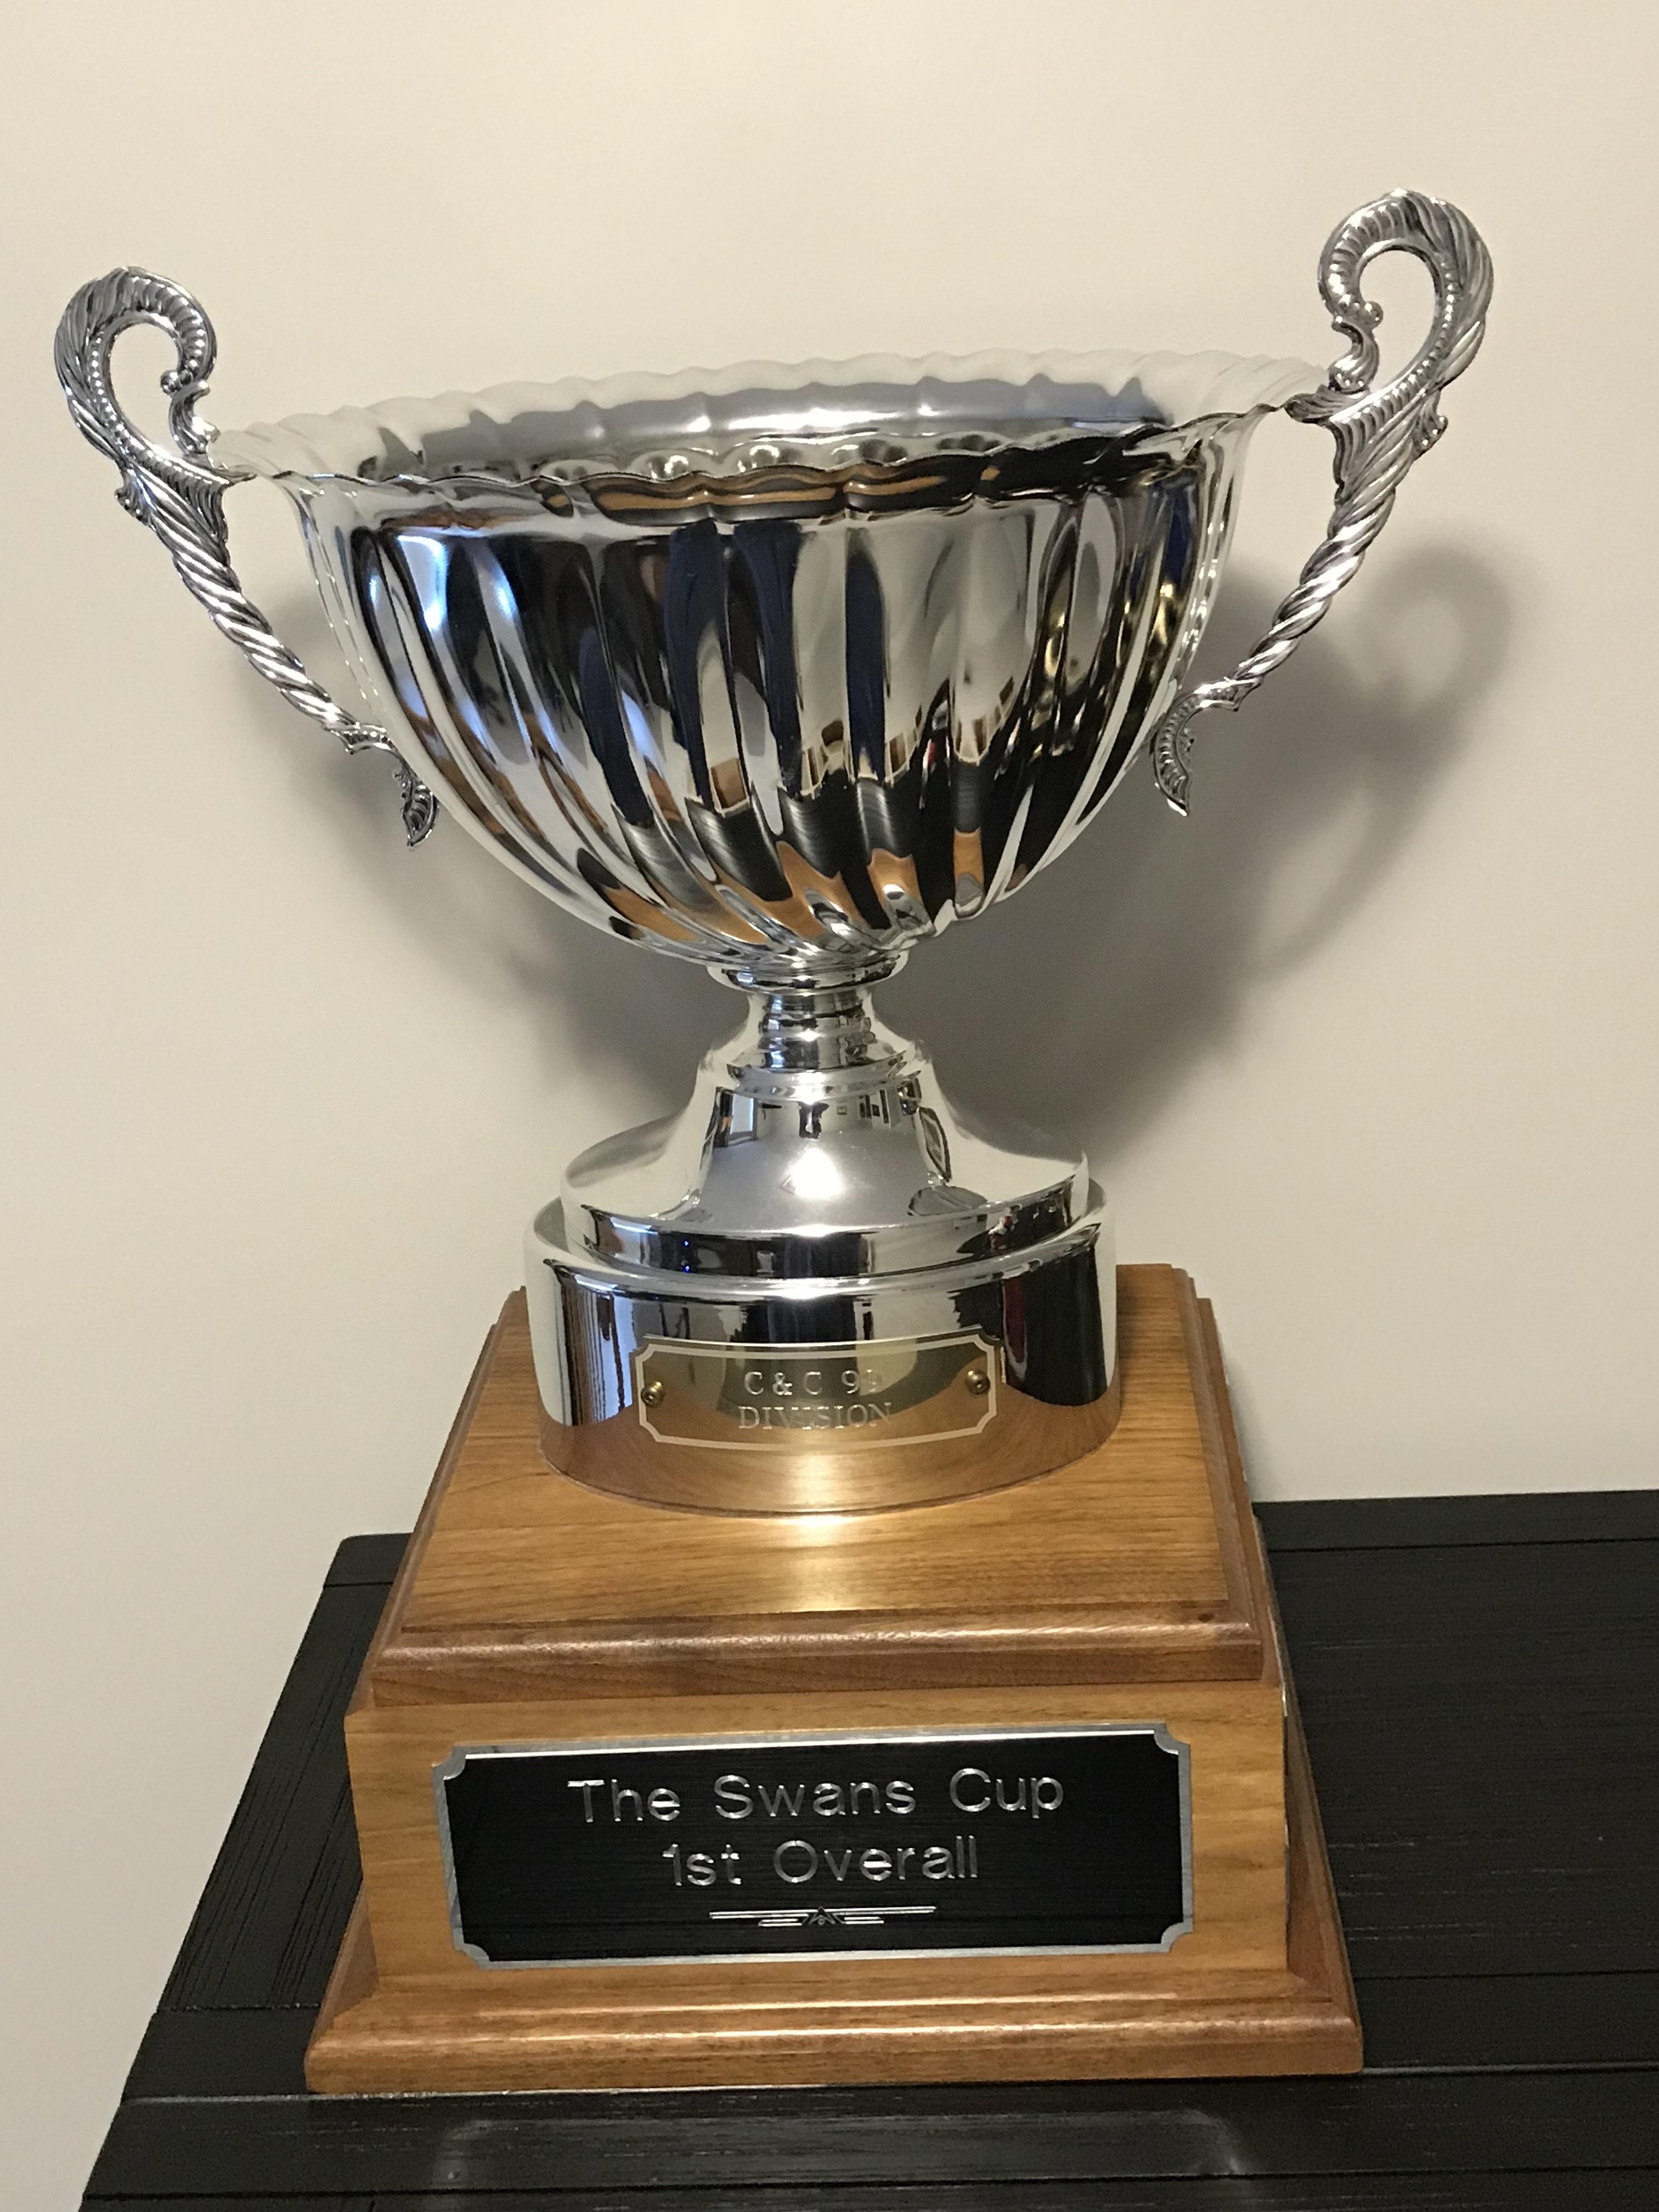 CC-99-Swans-Cup-Class-Championship-Trophy.jpg